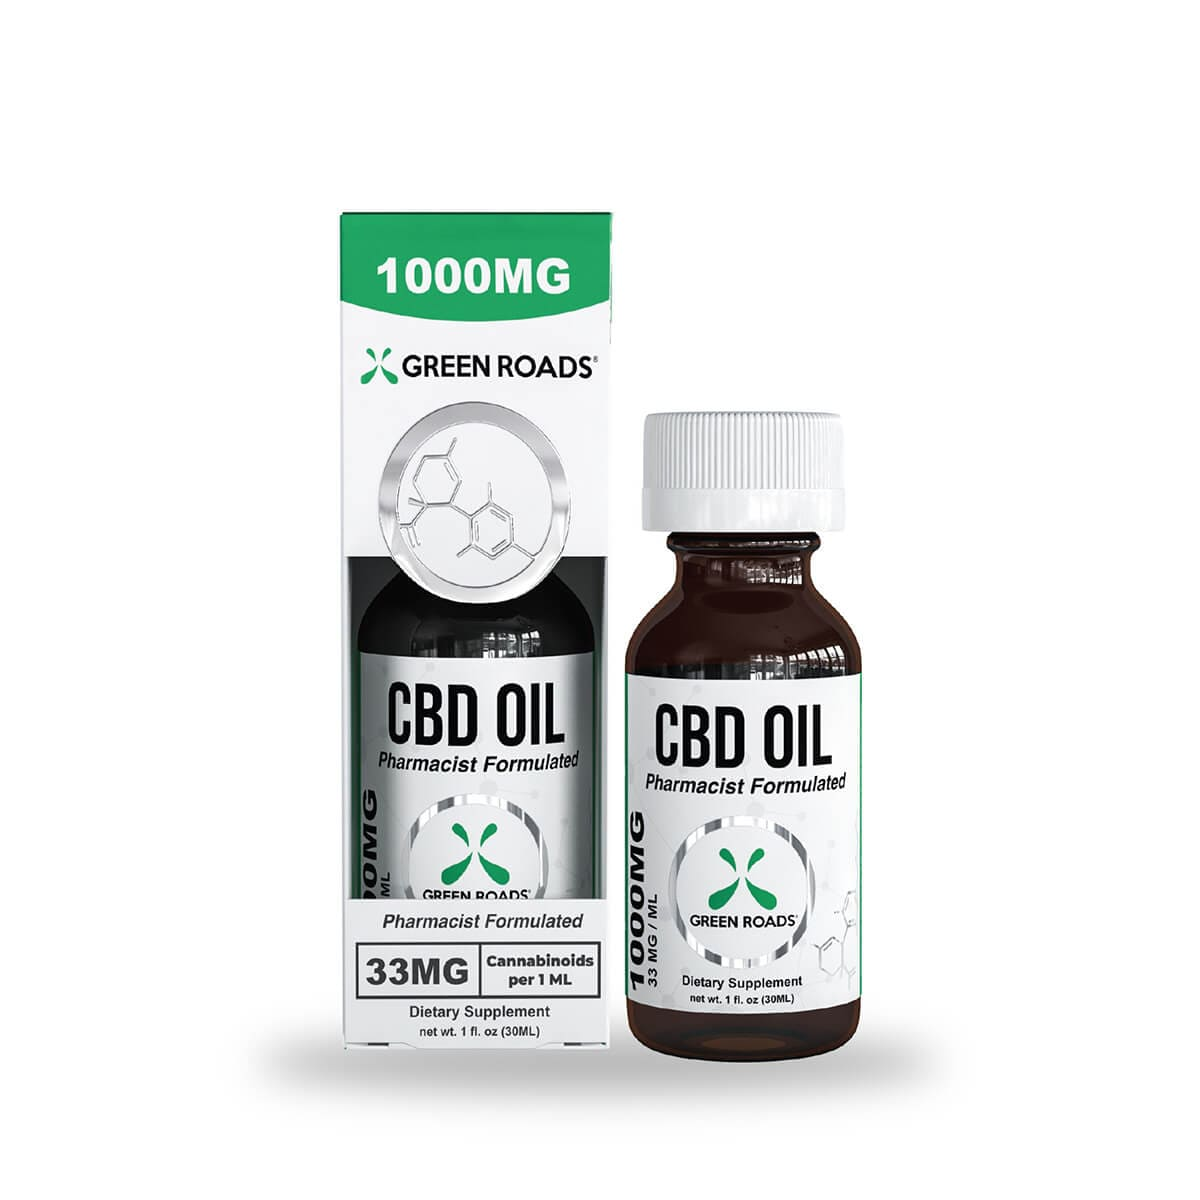 Green Roads CBD Oil - 1000mg (33mg CBD per serving) - 30ml